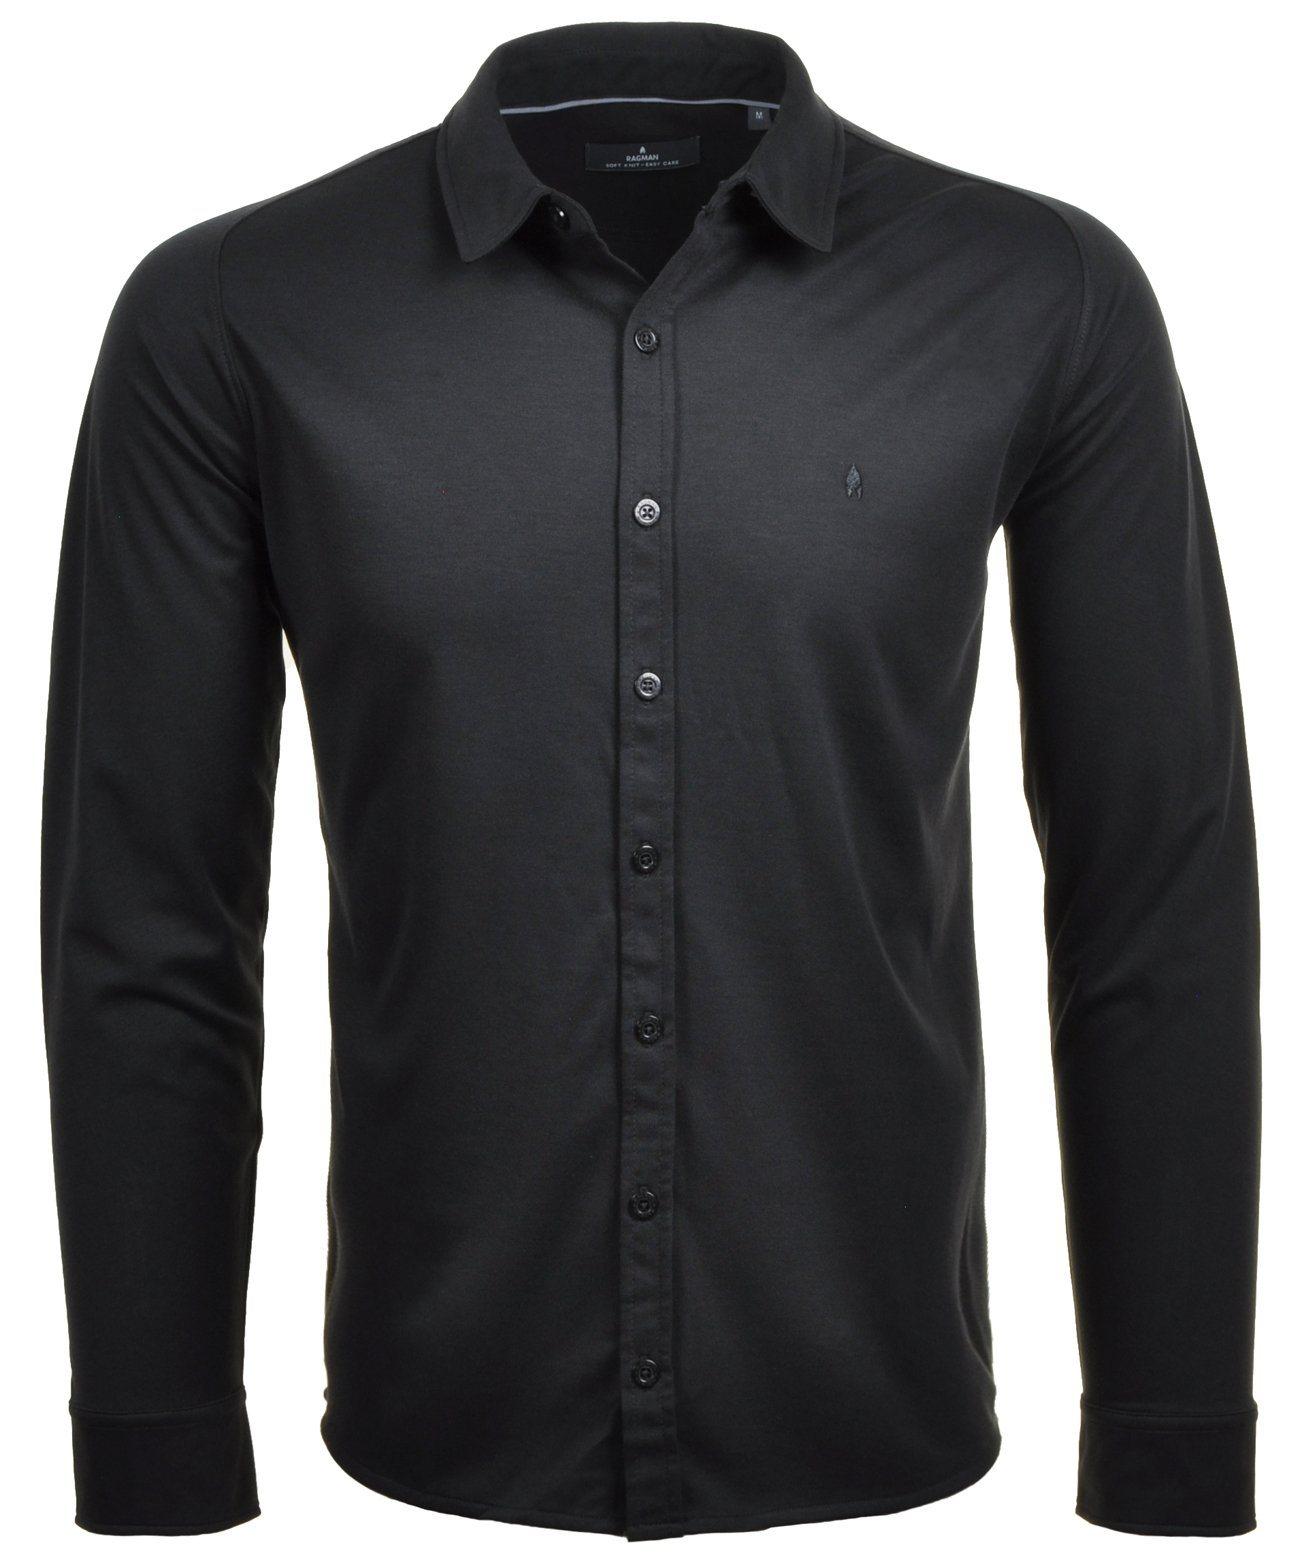 RAGMAN Hemd | Bekleidung > Hemden > Sonstige Hemden | Baumwolle | RAGMAN